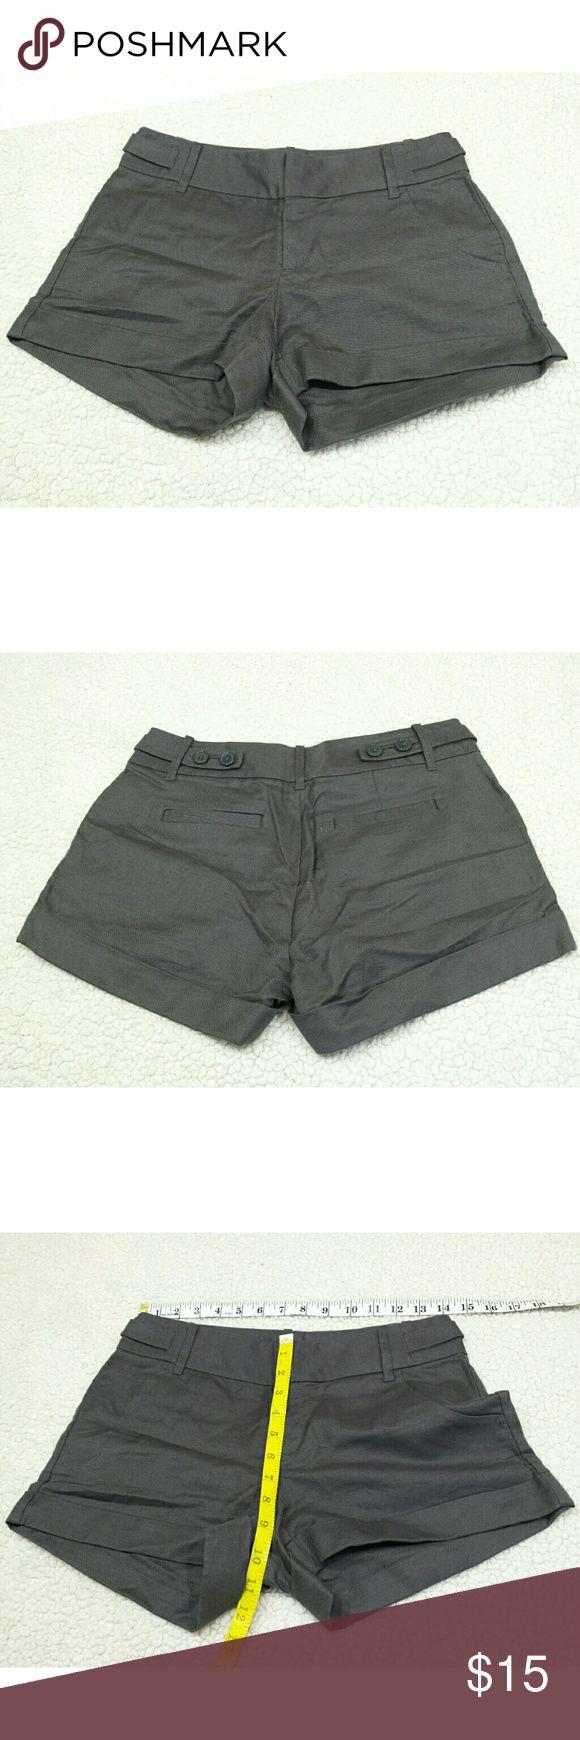 Banana Republic Gray Shorts size 2 Banana Republic Gray Shorts size 2 Banana Republic Shorts